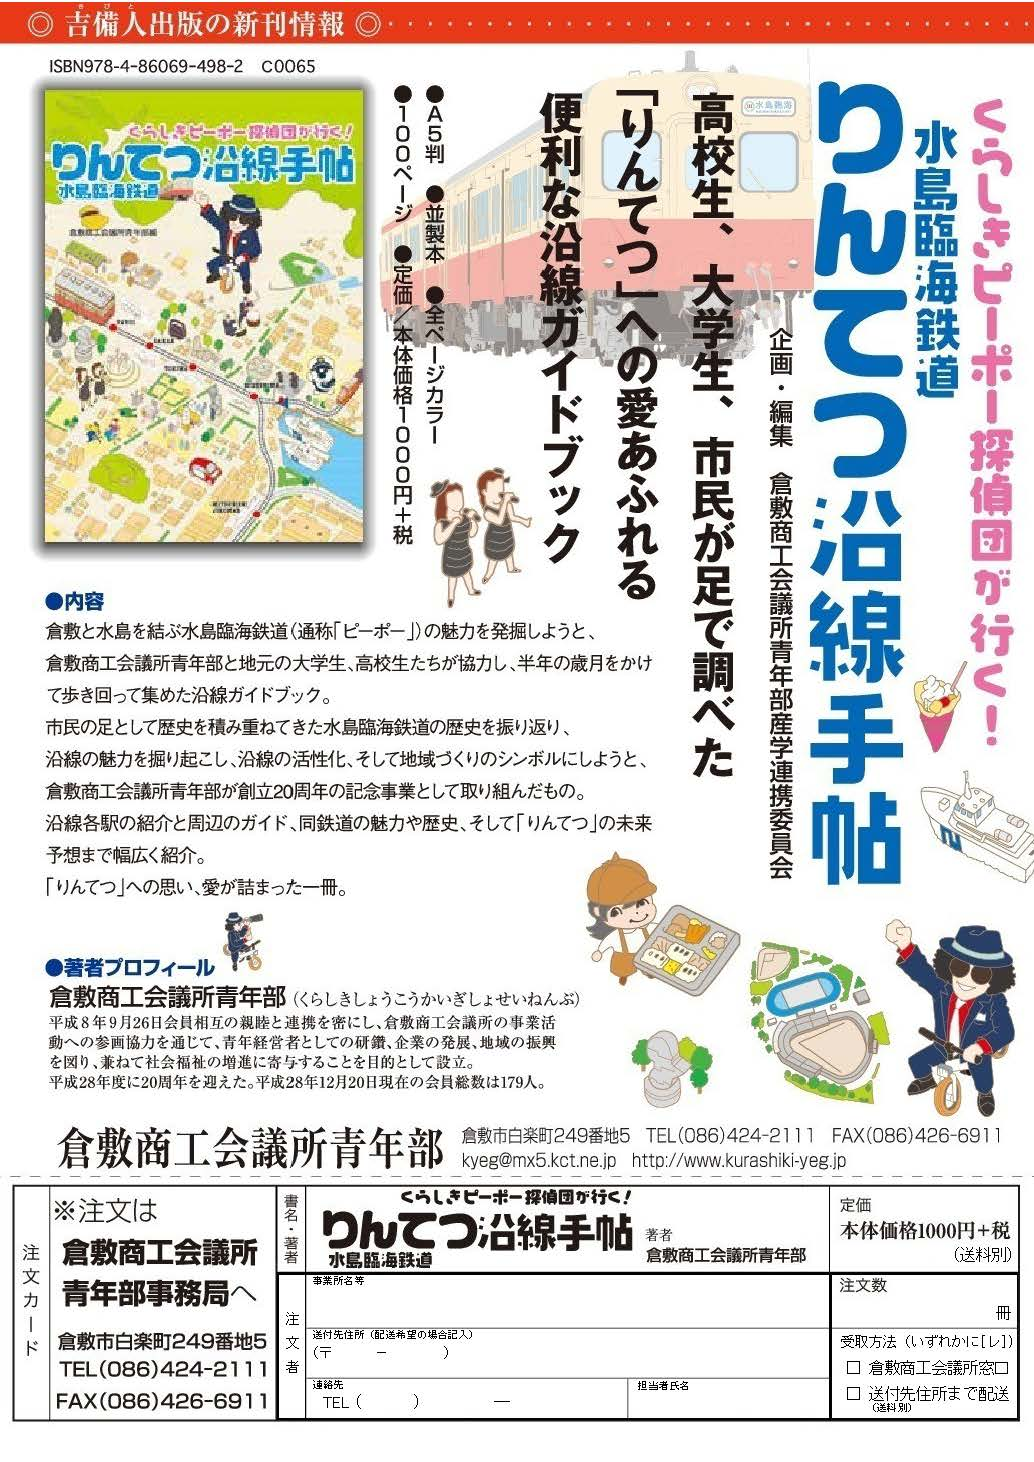 【web用】沿線手帖チラシ(修正版)